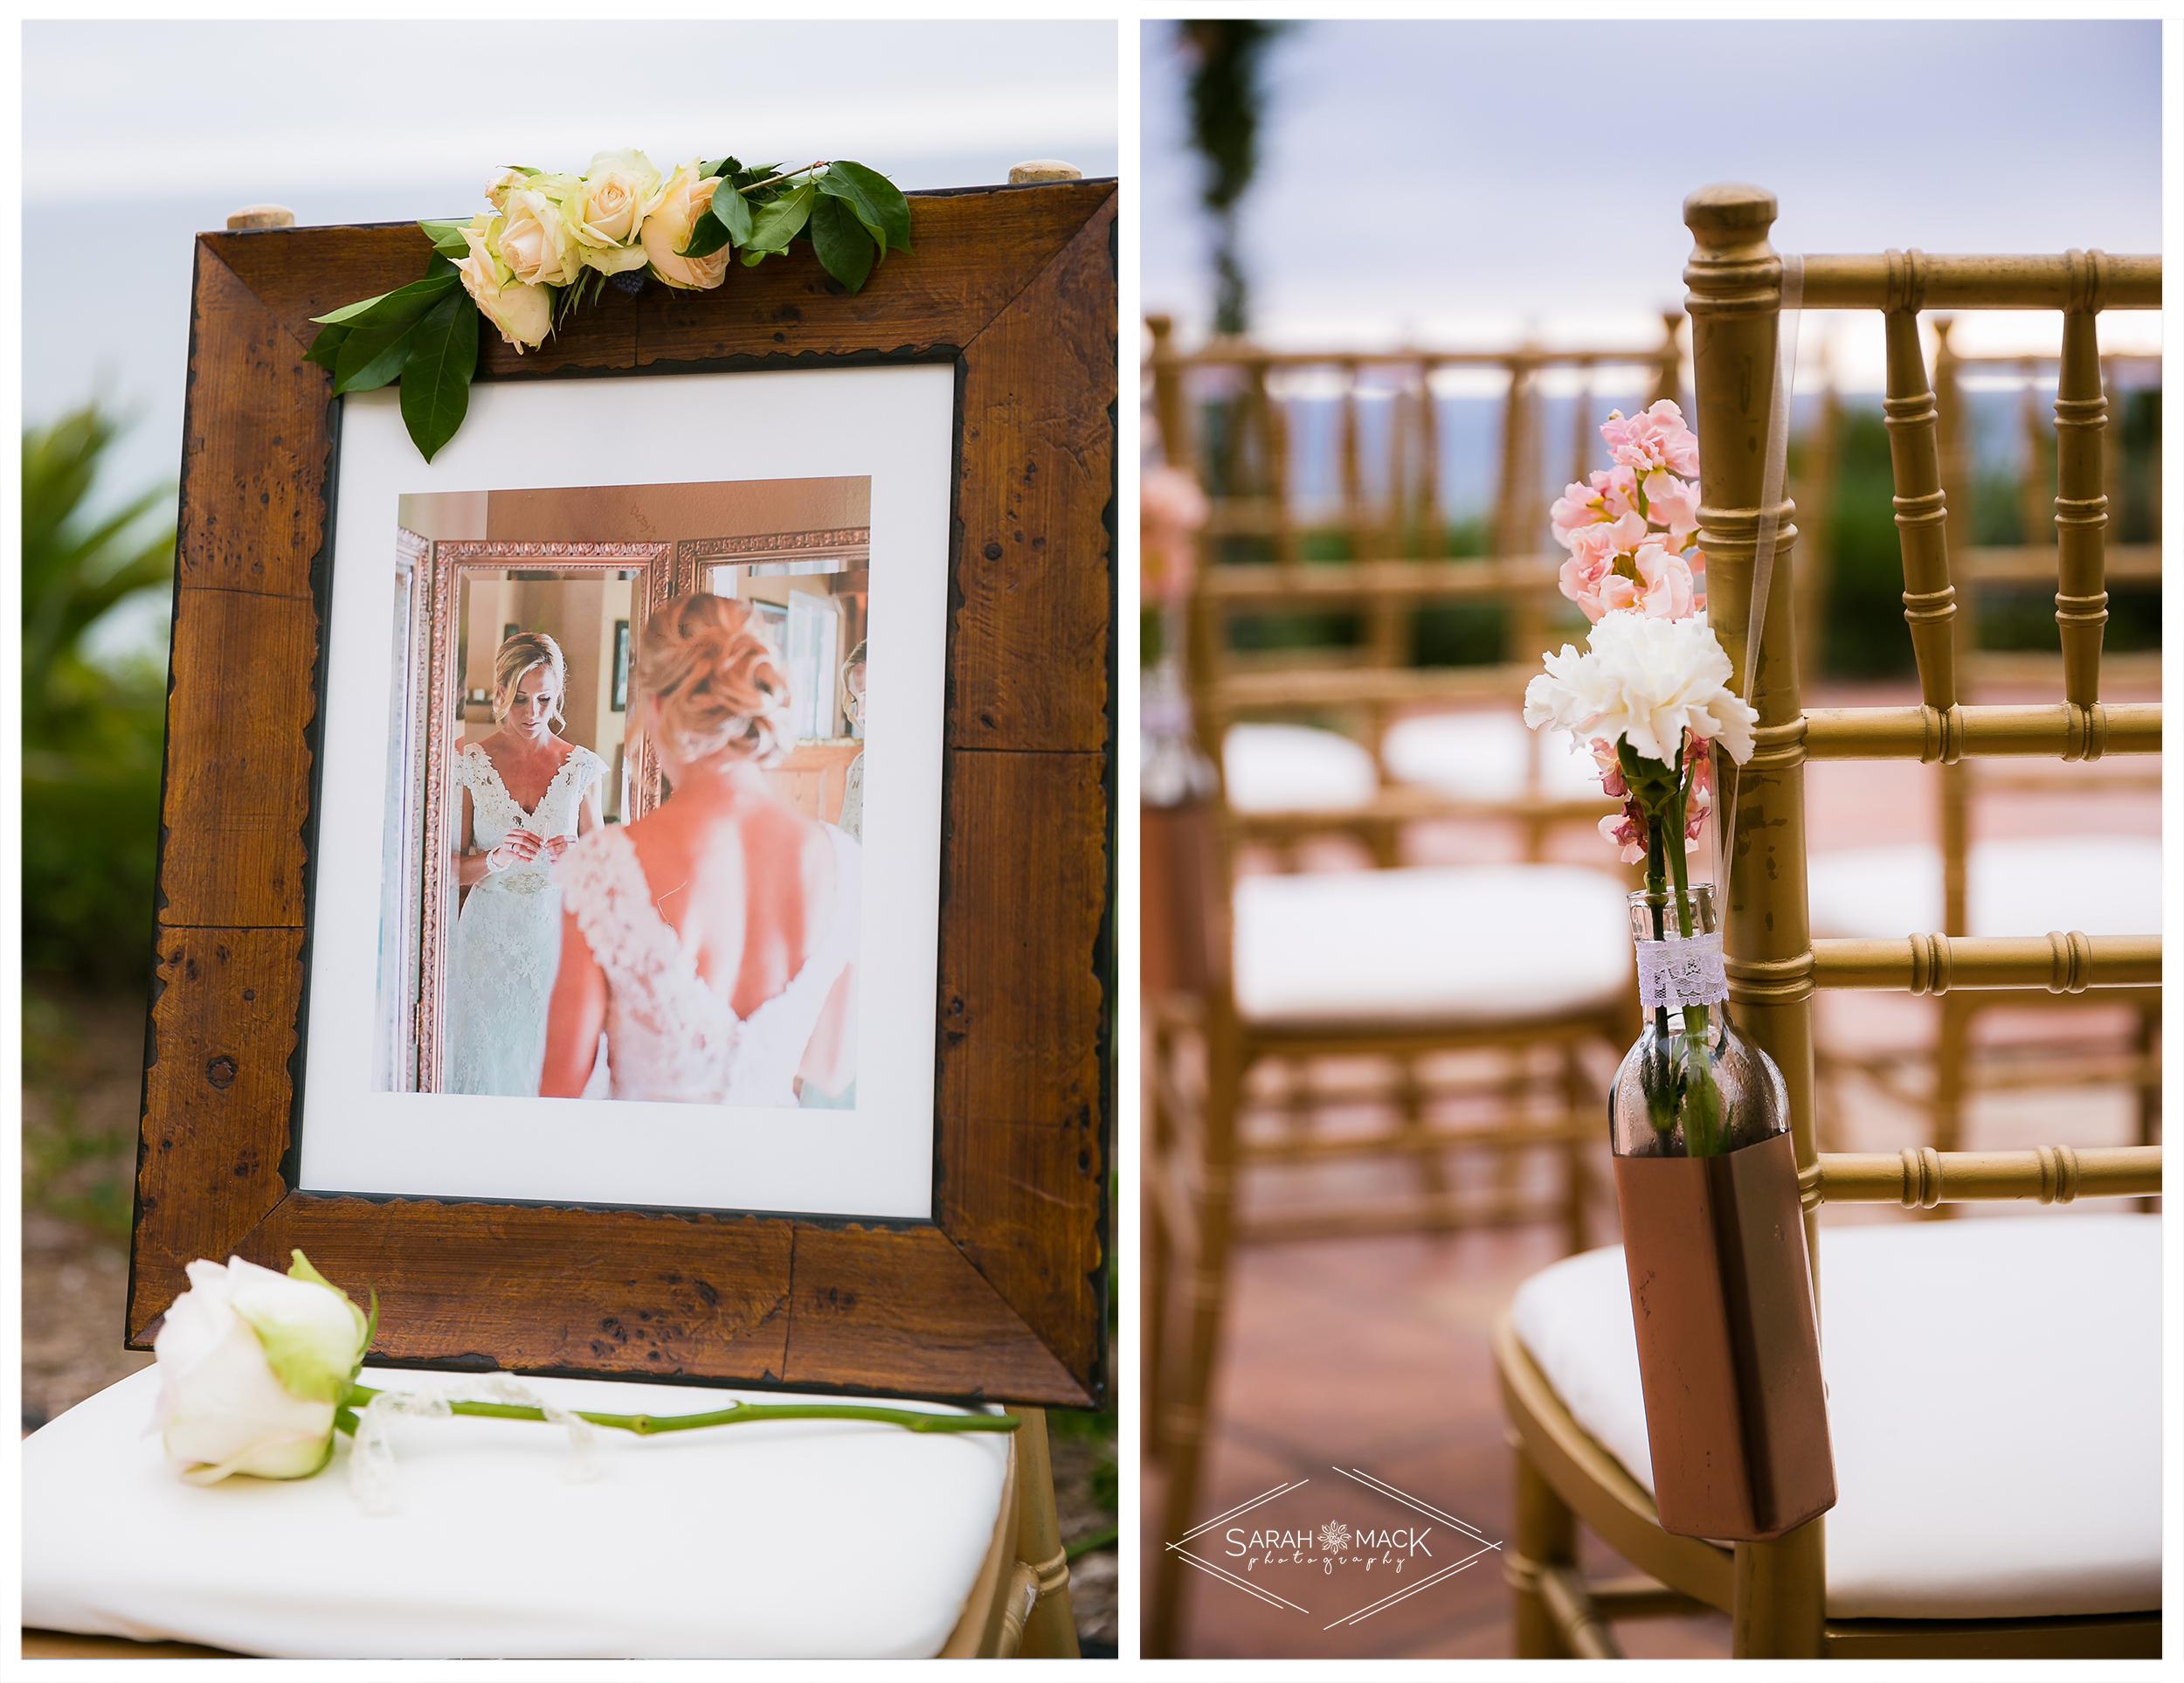 TD-Ritz-Carlton-Laguna-Niguel-Wedding-Photography-10.jpg